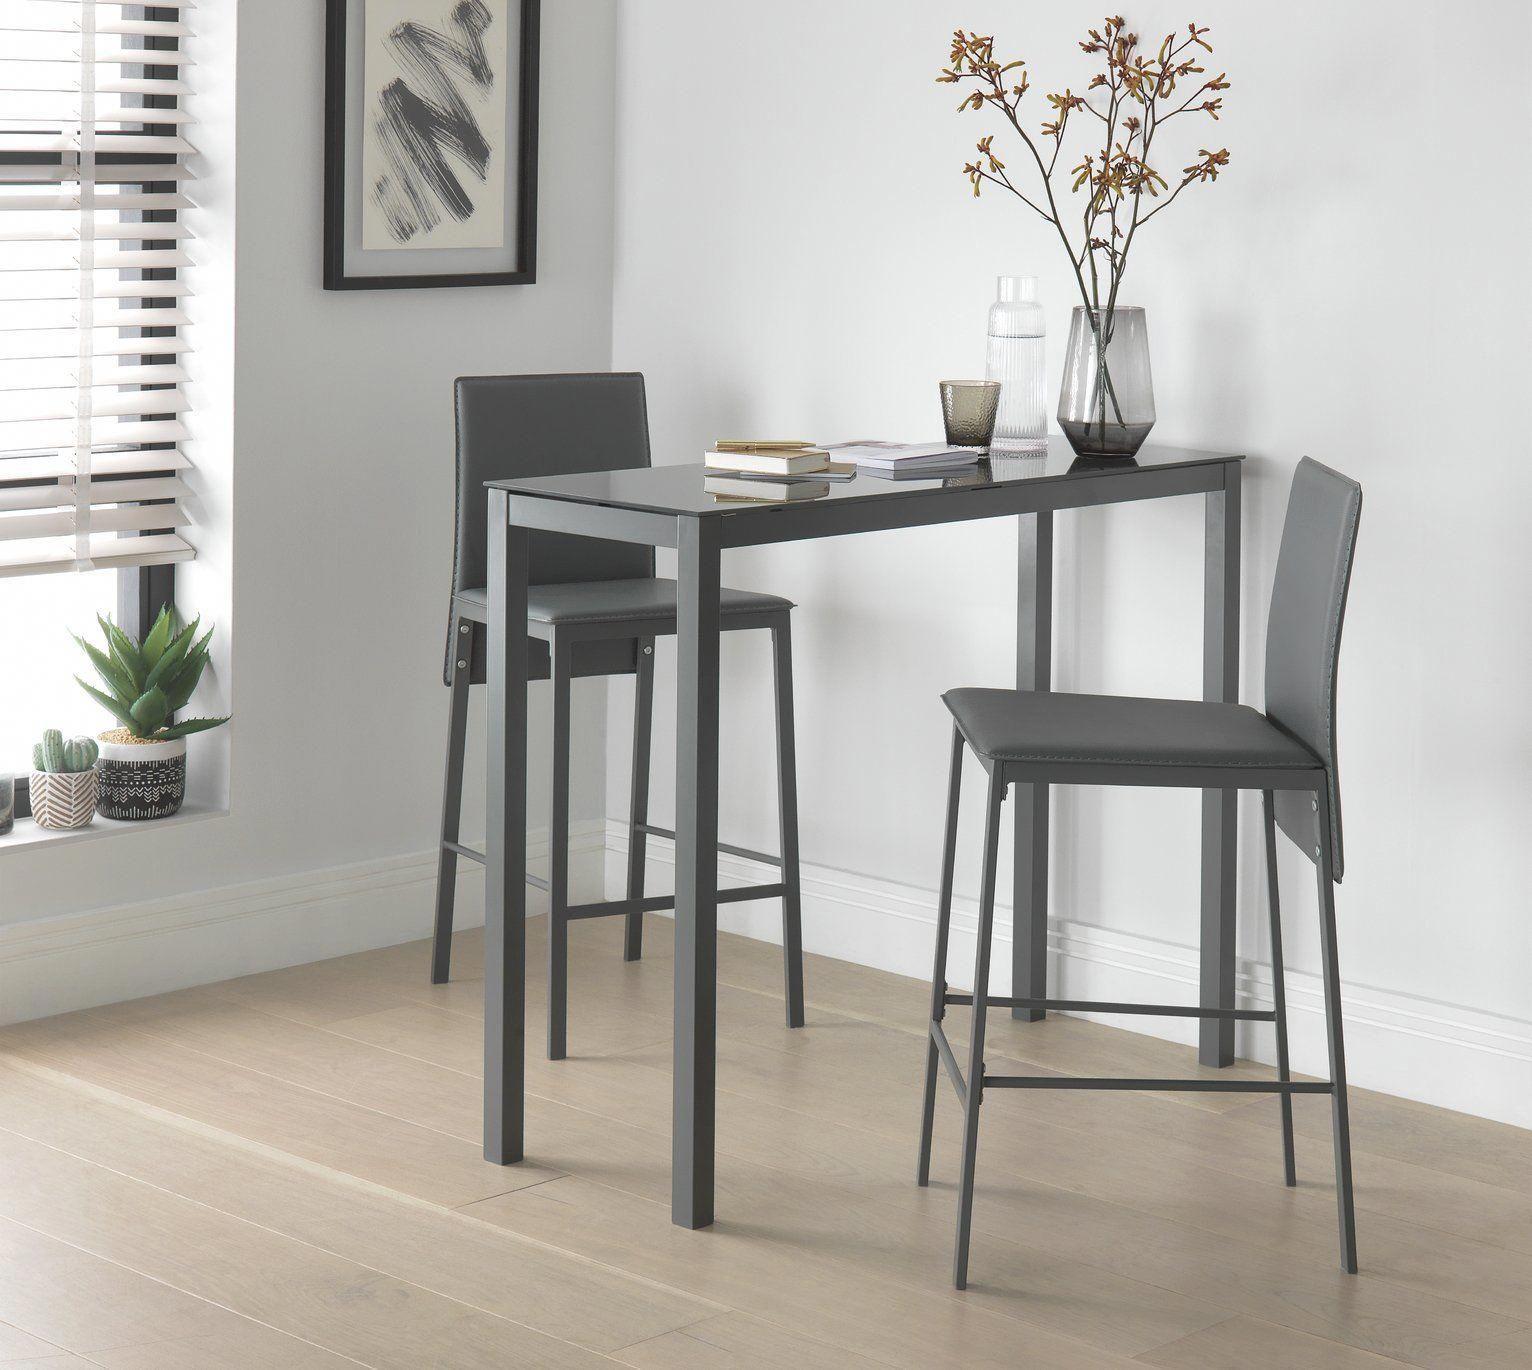 Buy Argos Home Lido Glass Bar Table & 9 Grey Chairs   Space saving ...